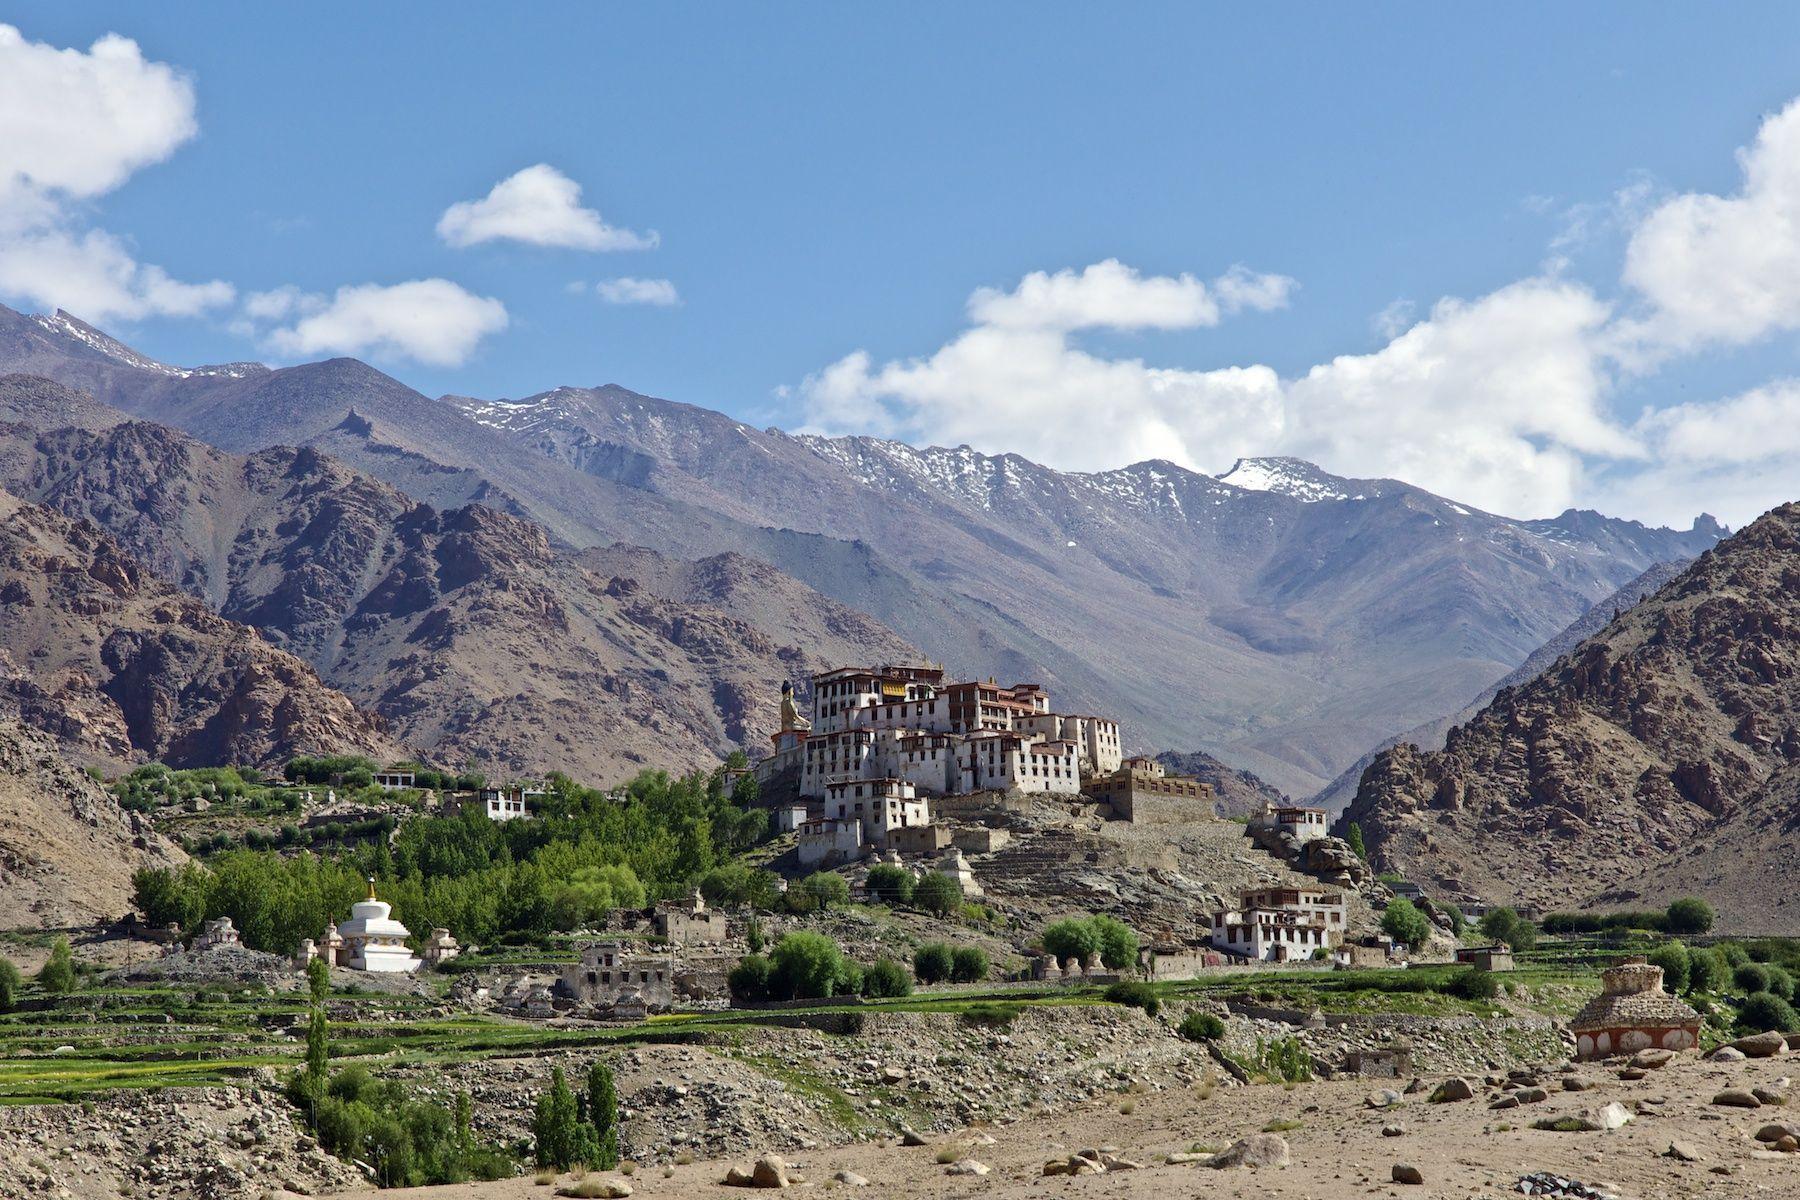 1the_likir_gompa__monastery__built_in_the_14th_century__ladakh__india.jpg